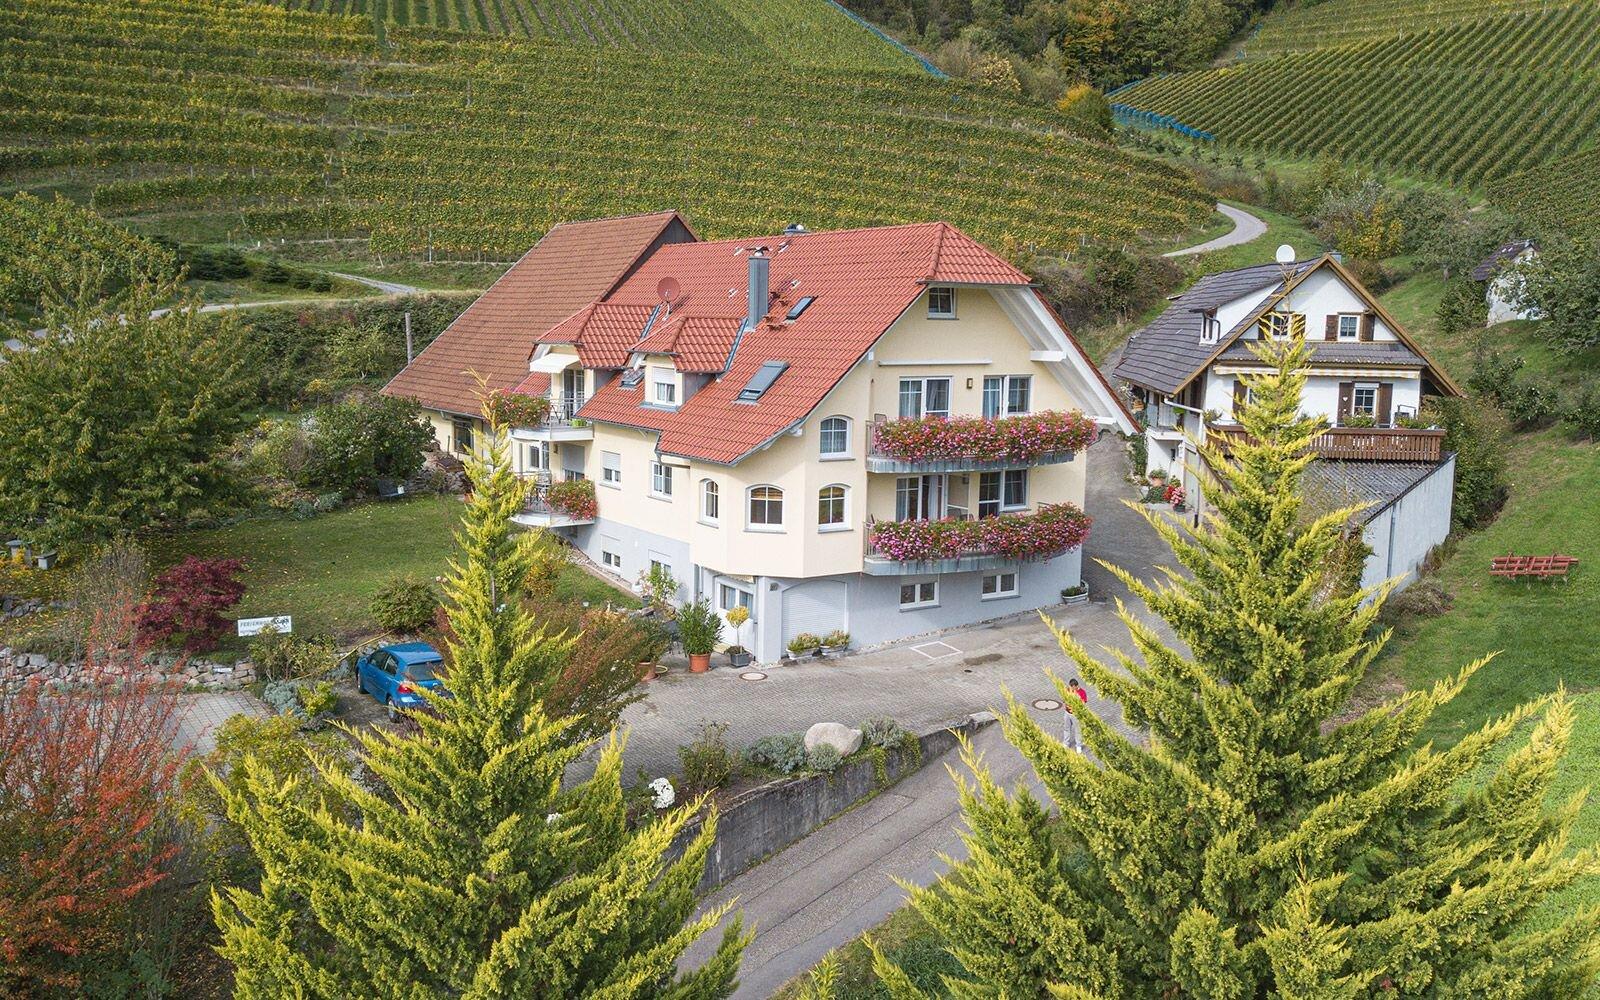 Ferienhof Mayer in Oberkirch/Lautenbach